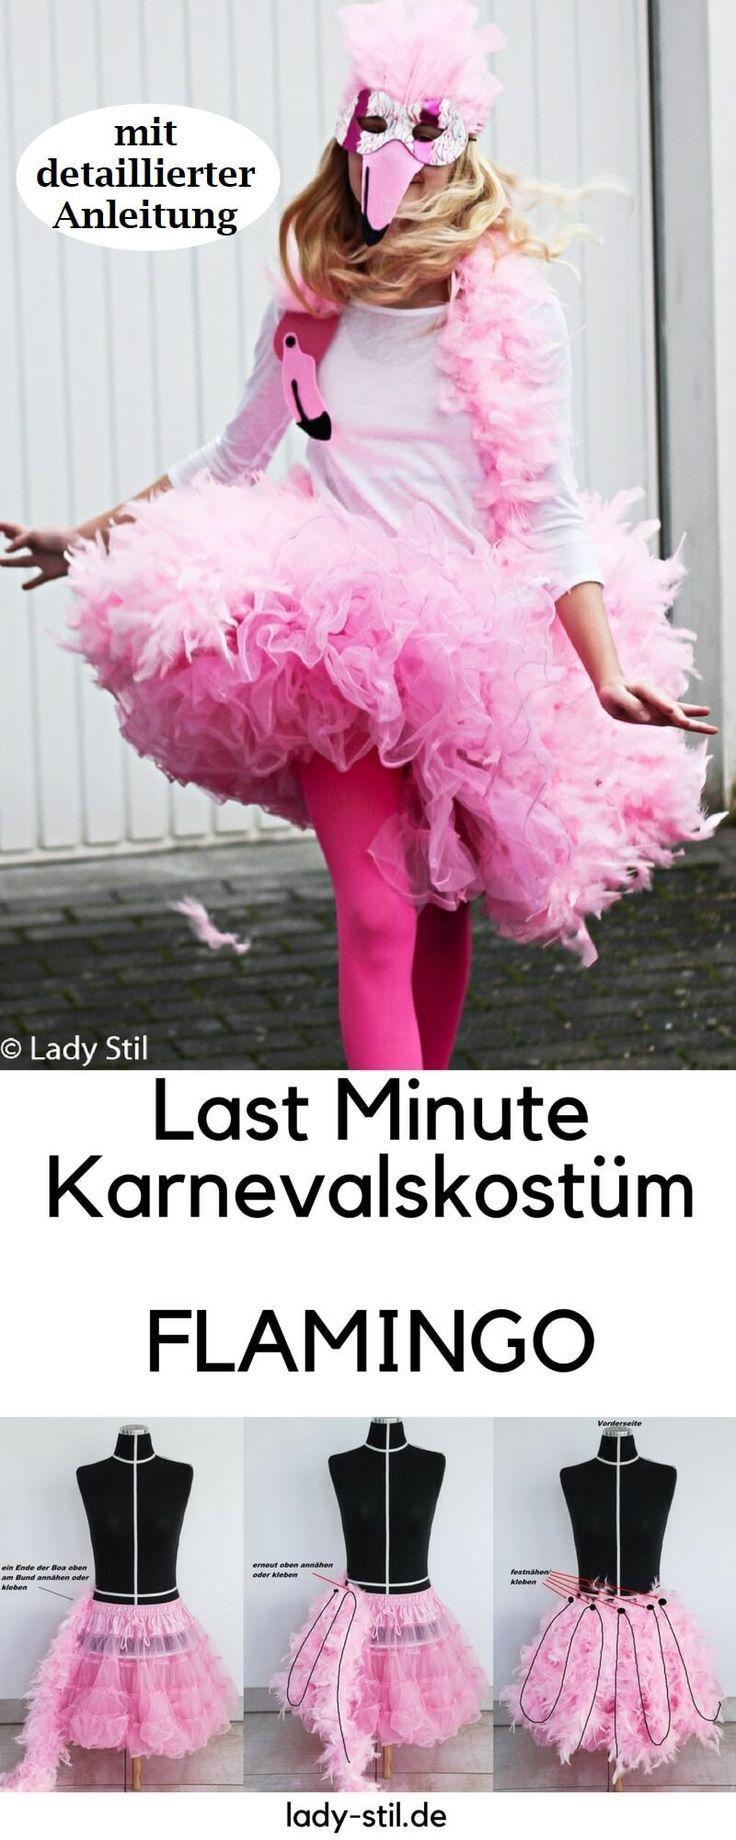 Last Minute Karnevalskostüm Flamingo - lady-stil.de